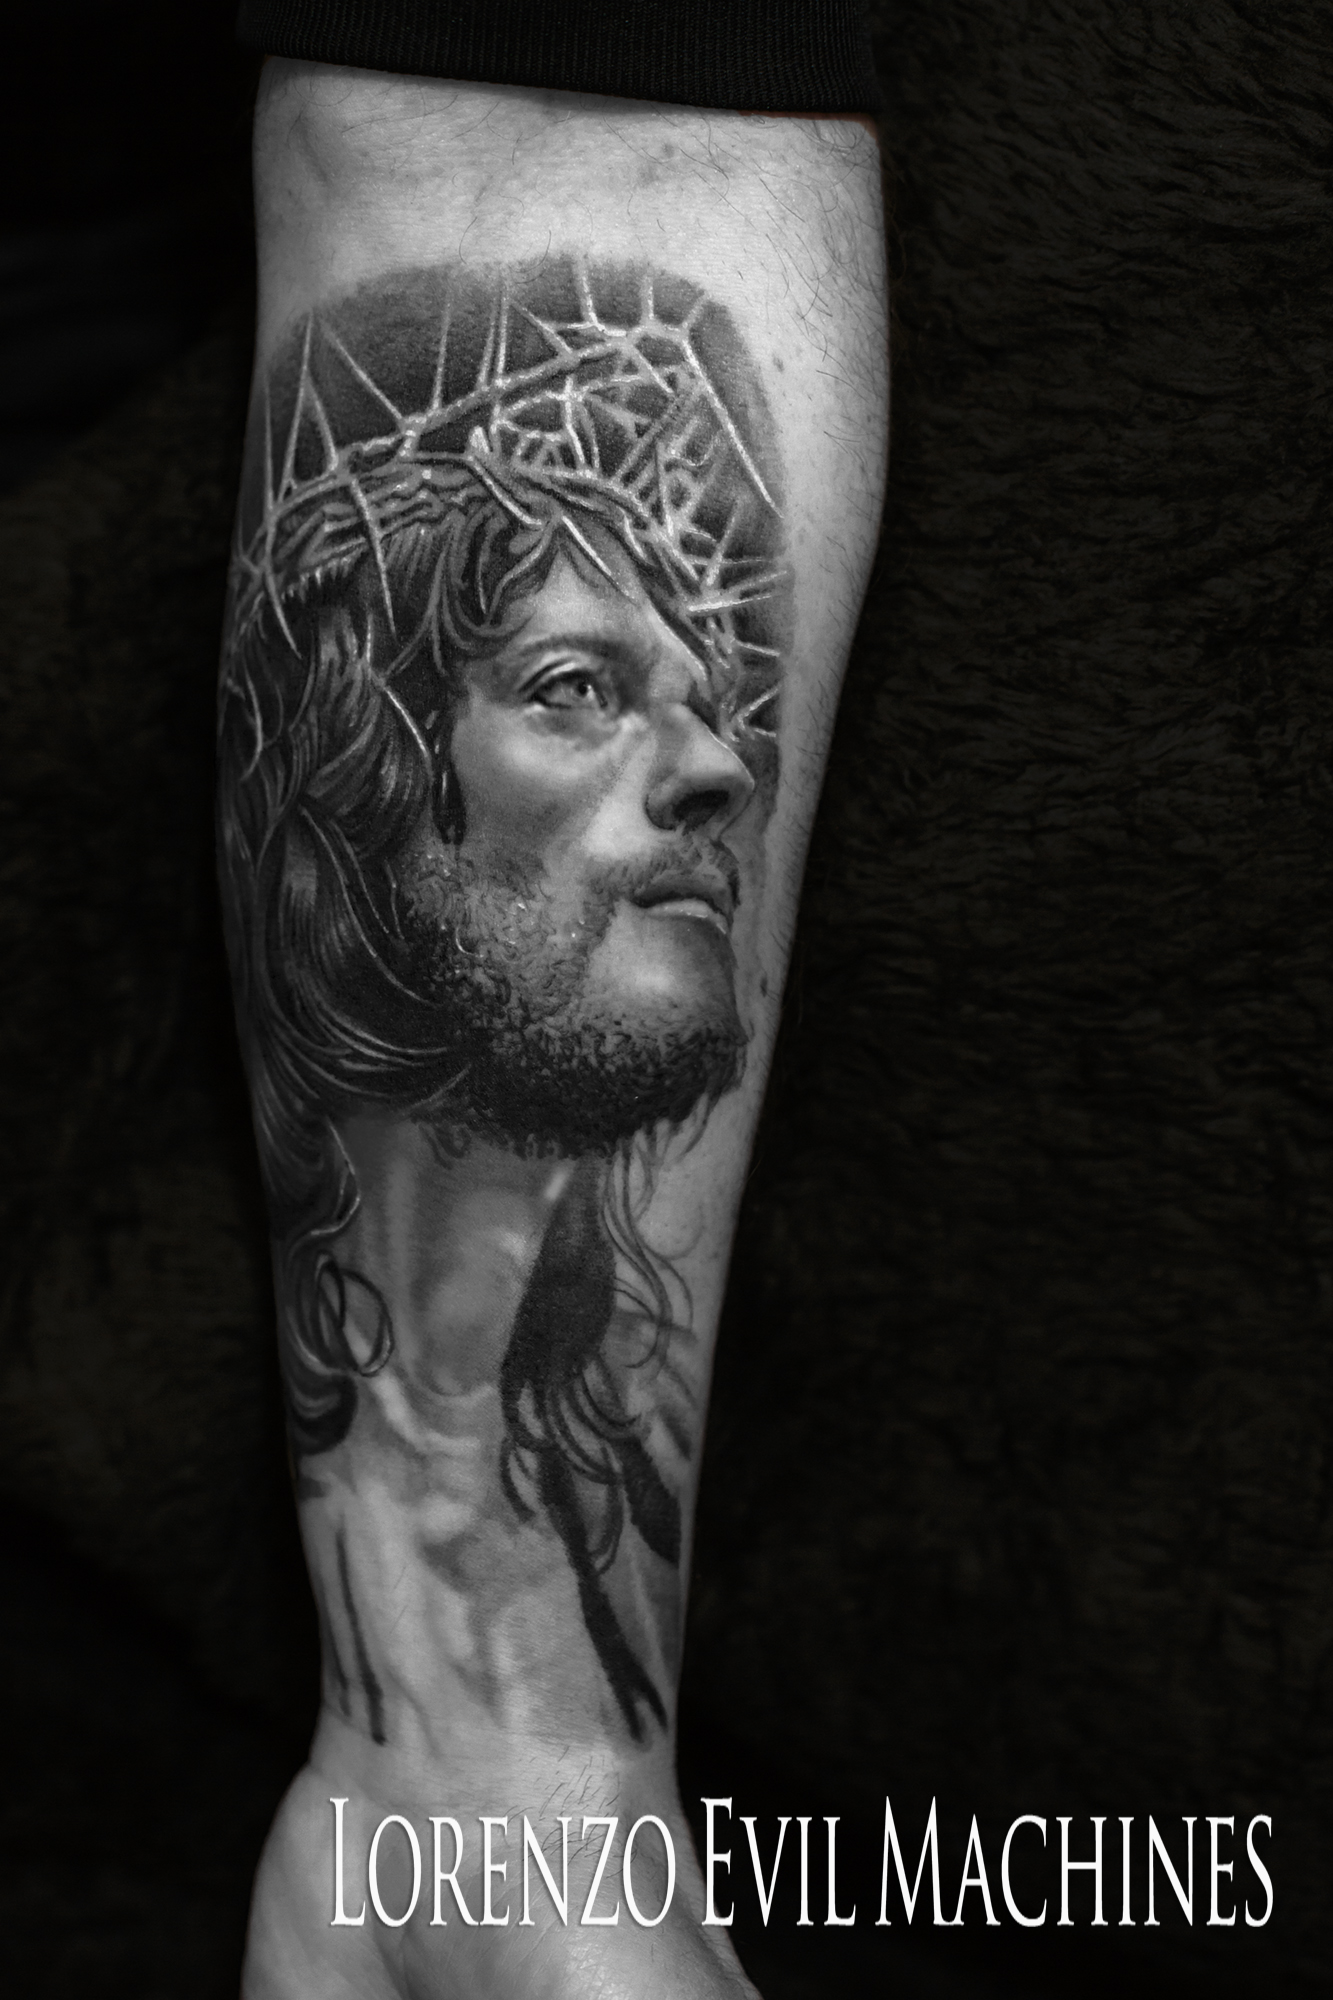 Cristo_Jesus_Christ_Crocefissione_Zeffirelli_Cross_Lorenzo_tatuatore_Evil_Machines_realistic_tattoo_tatuaggi_realistici_3d_Roma_migliore_best